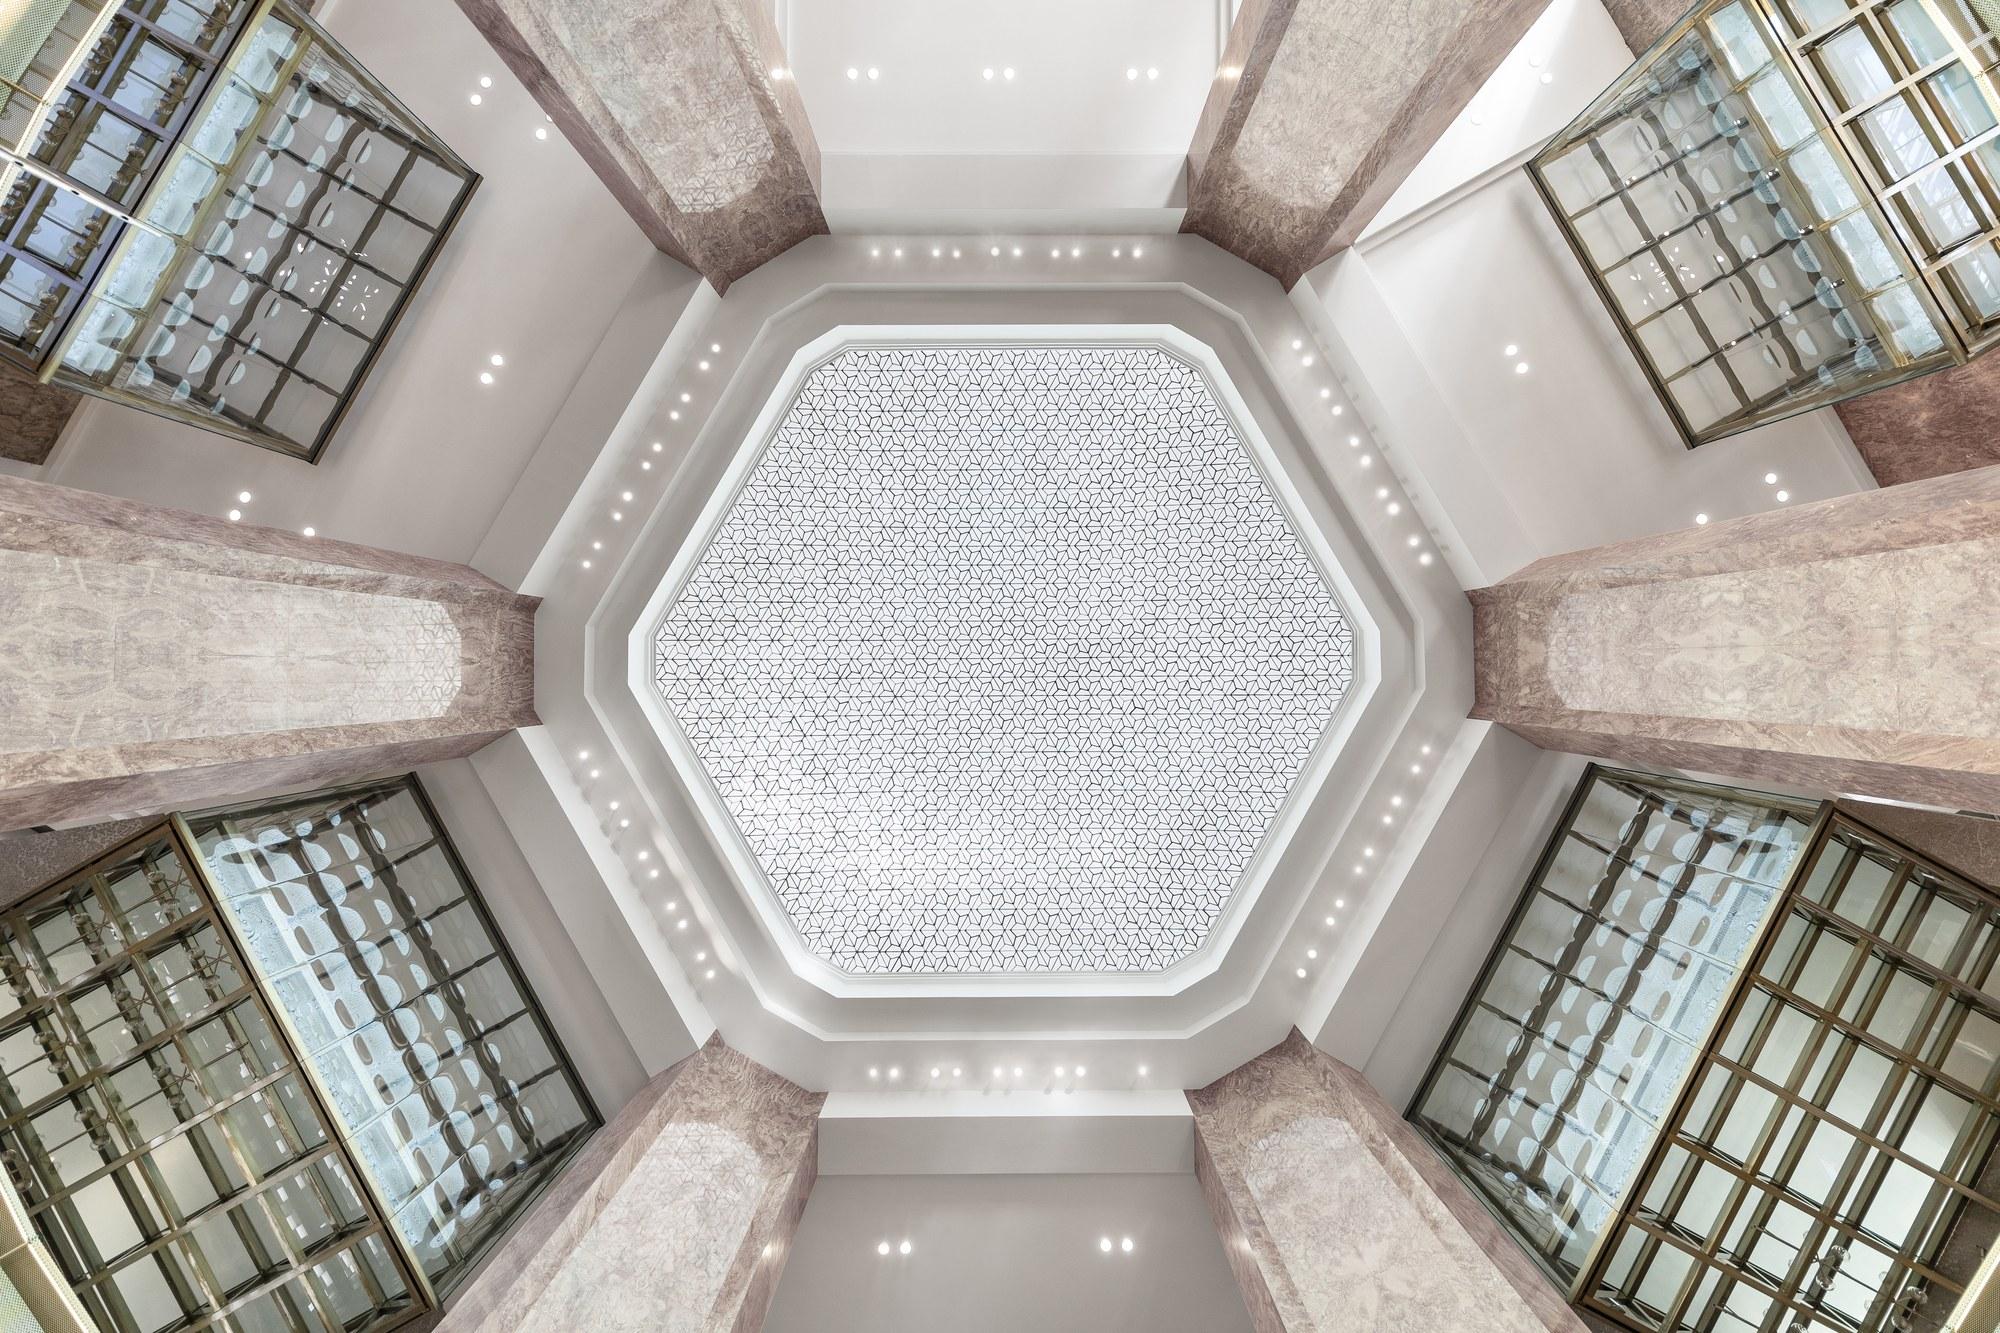 https://i.ibb.co/SytYbLd/Galeries-Lafayette-Champs-Elys-es-Coupole-mars-2019-c-Delfino-Sisto-Legnani-e-Marco-Cappelletti.jpg